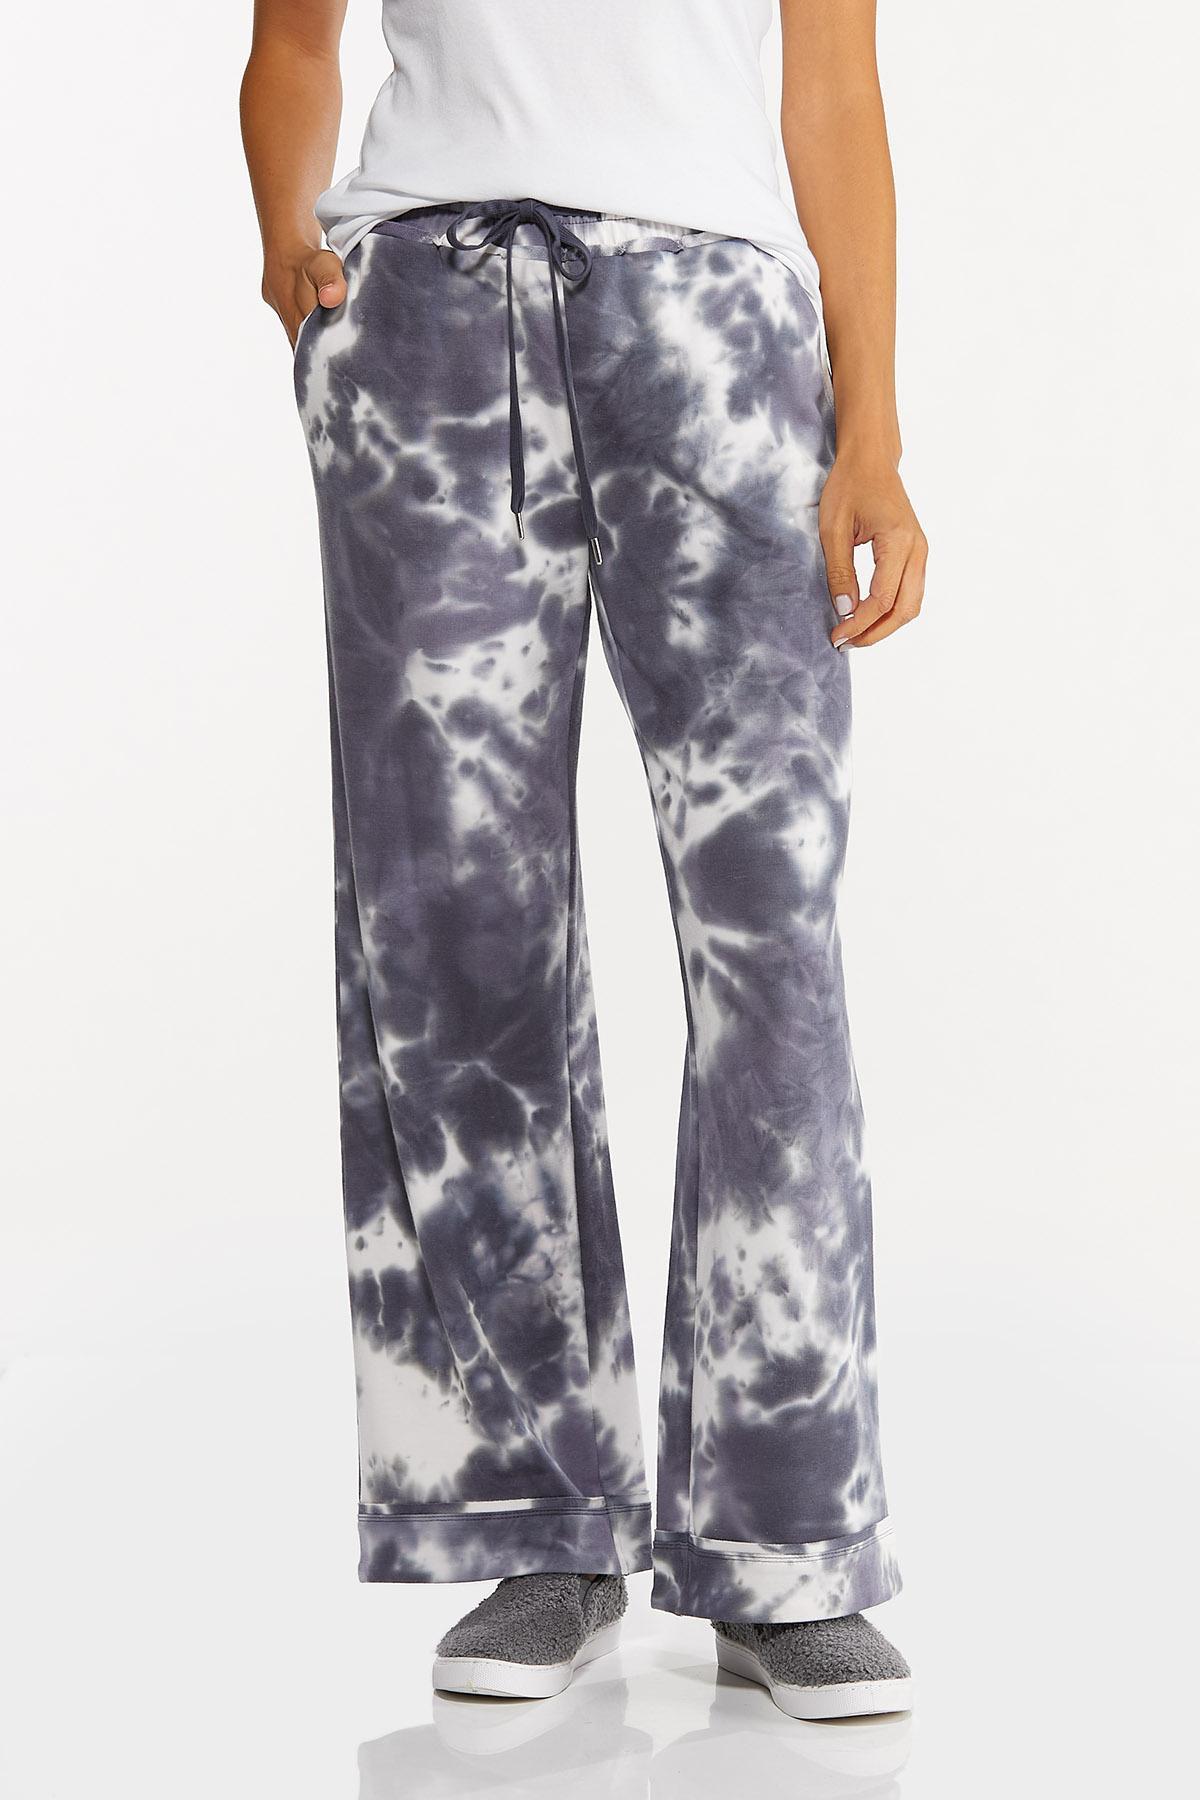 Tie Dye Pants (Item #44652616)